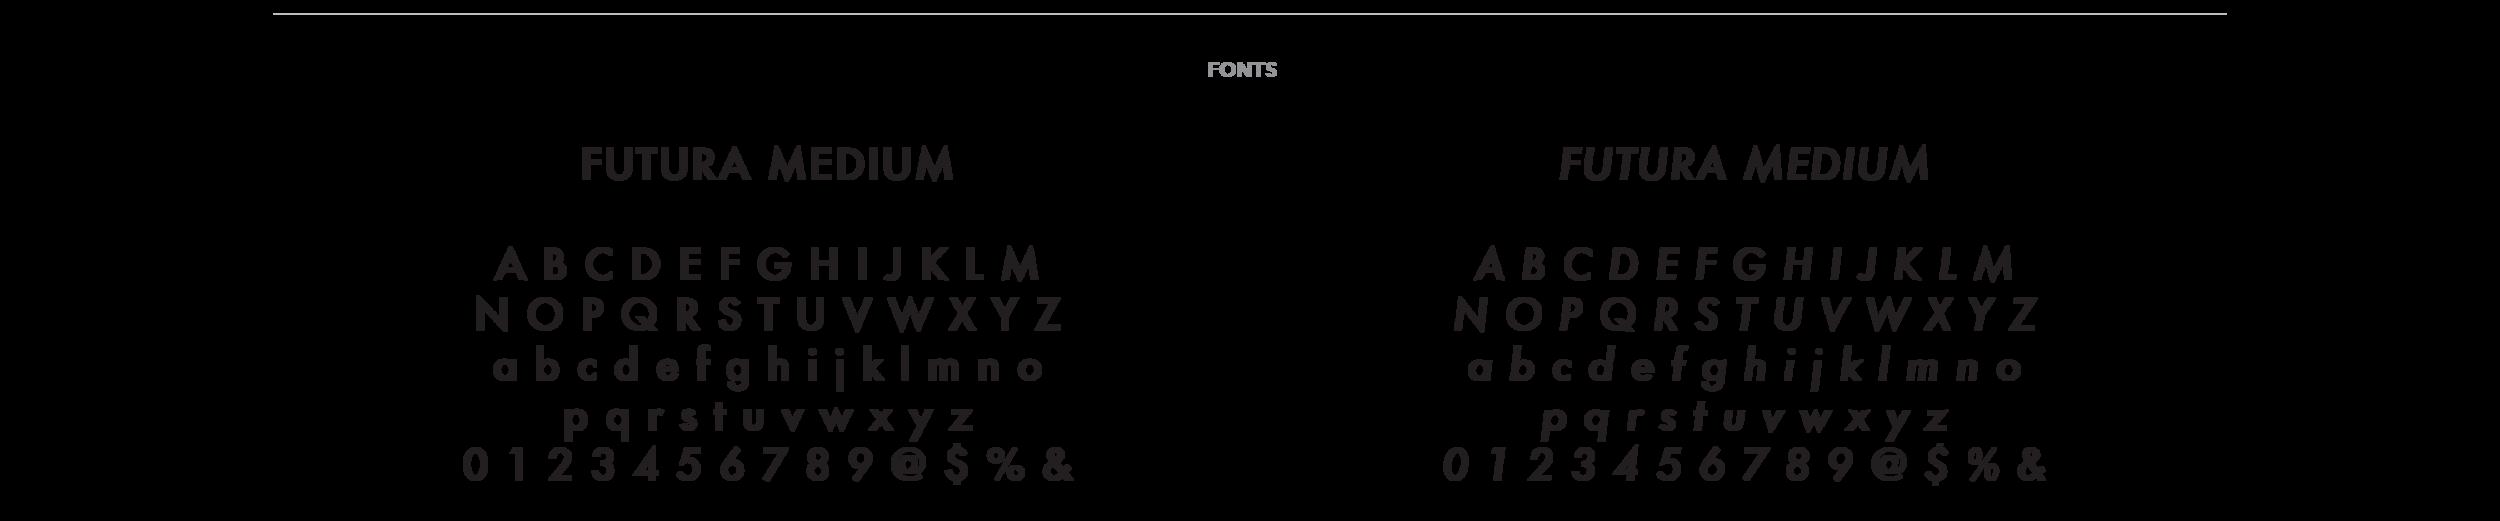 Futura Font for Modern Design